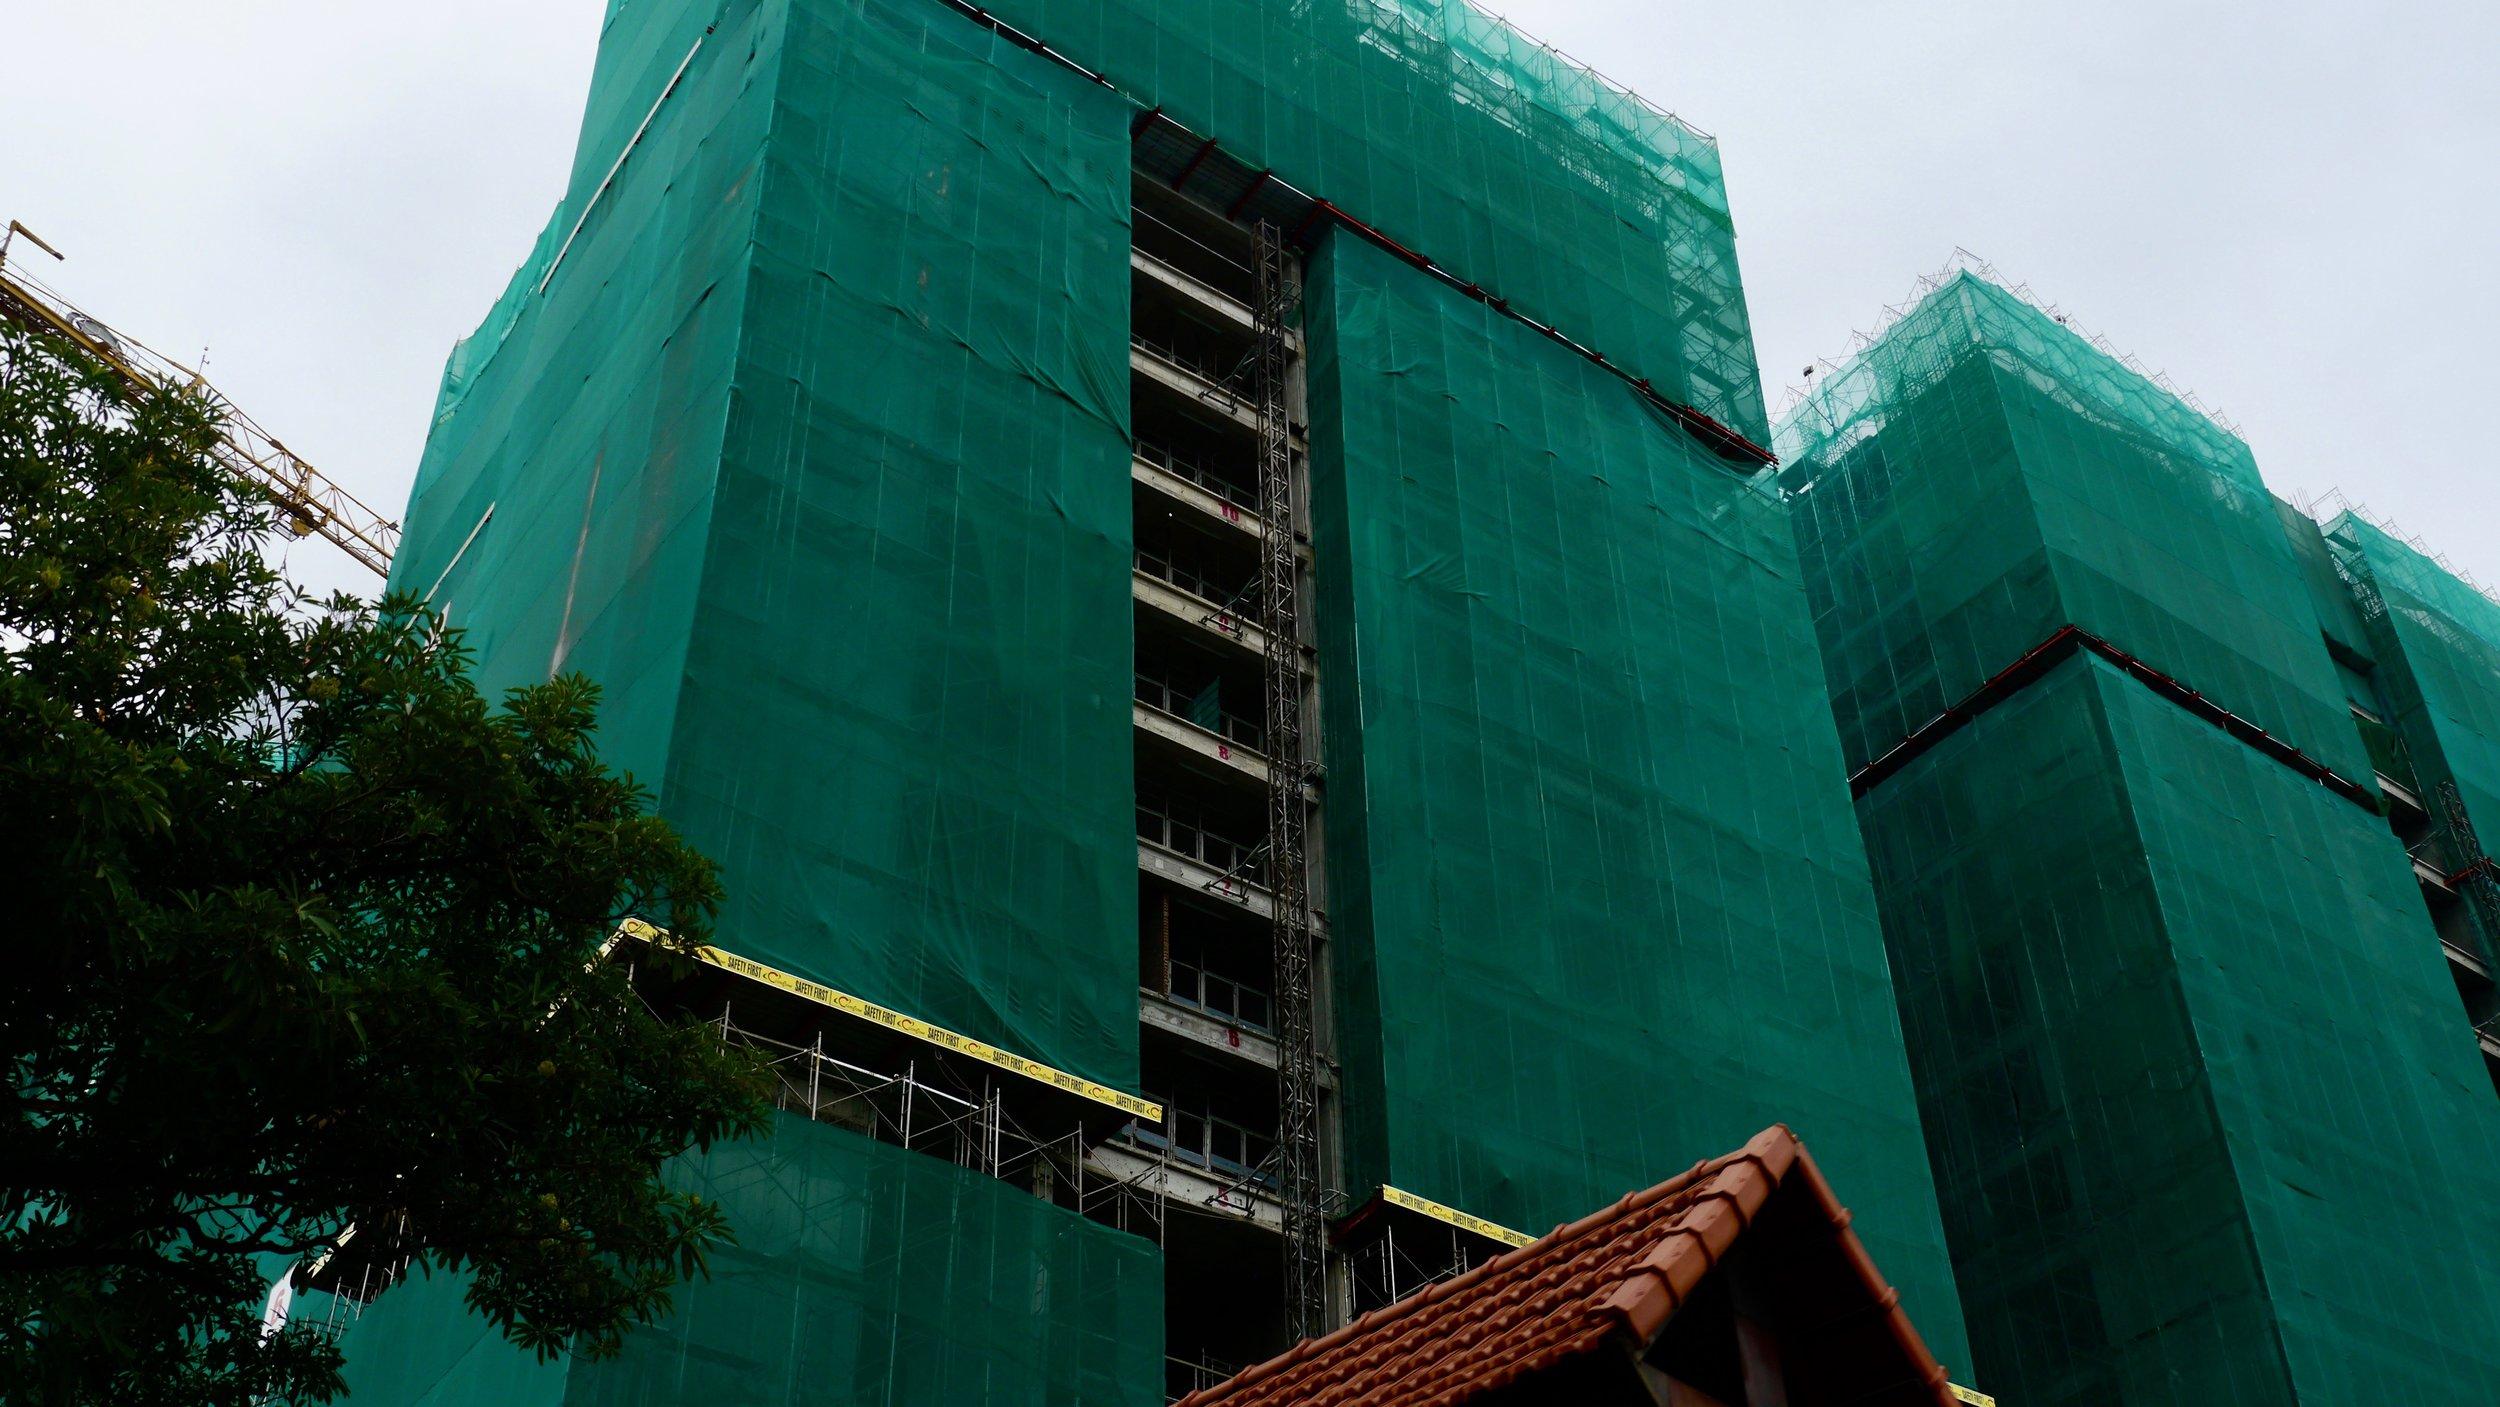 Peri-Urban Construction 03, Hanoi